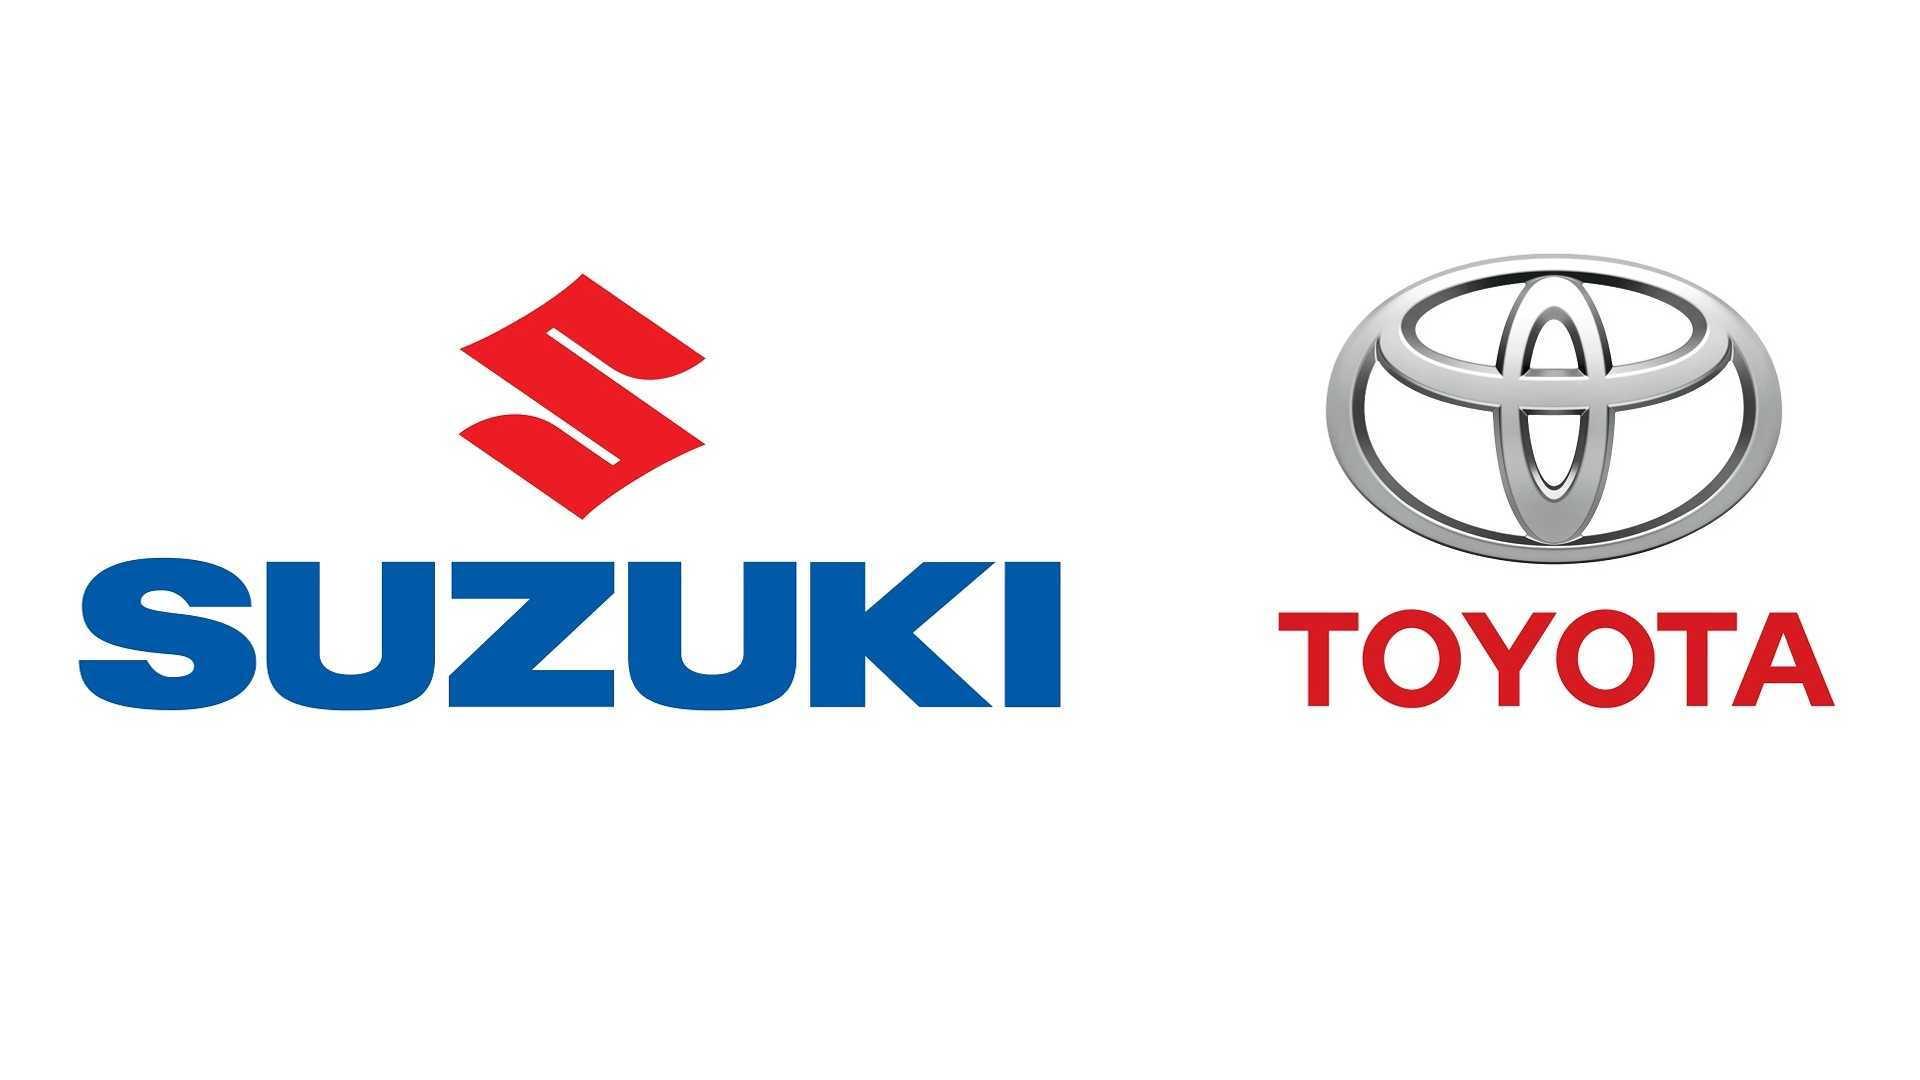 Suzuki and Toyota logos